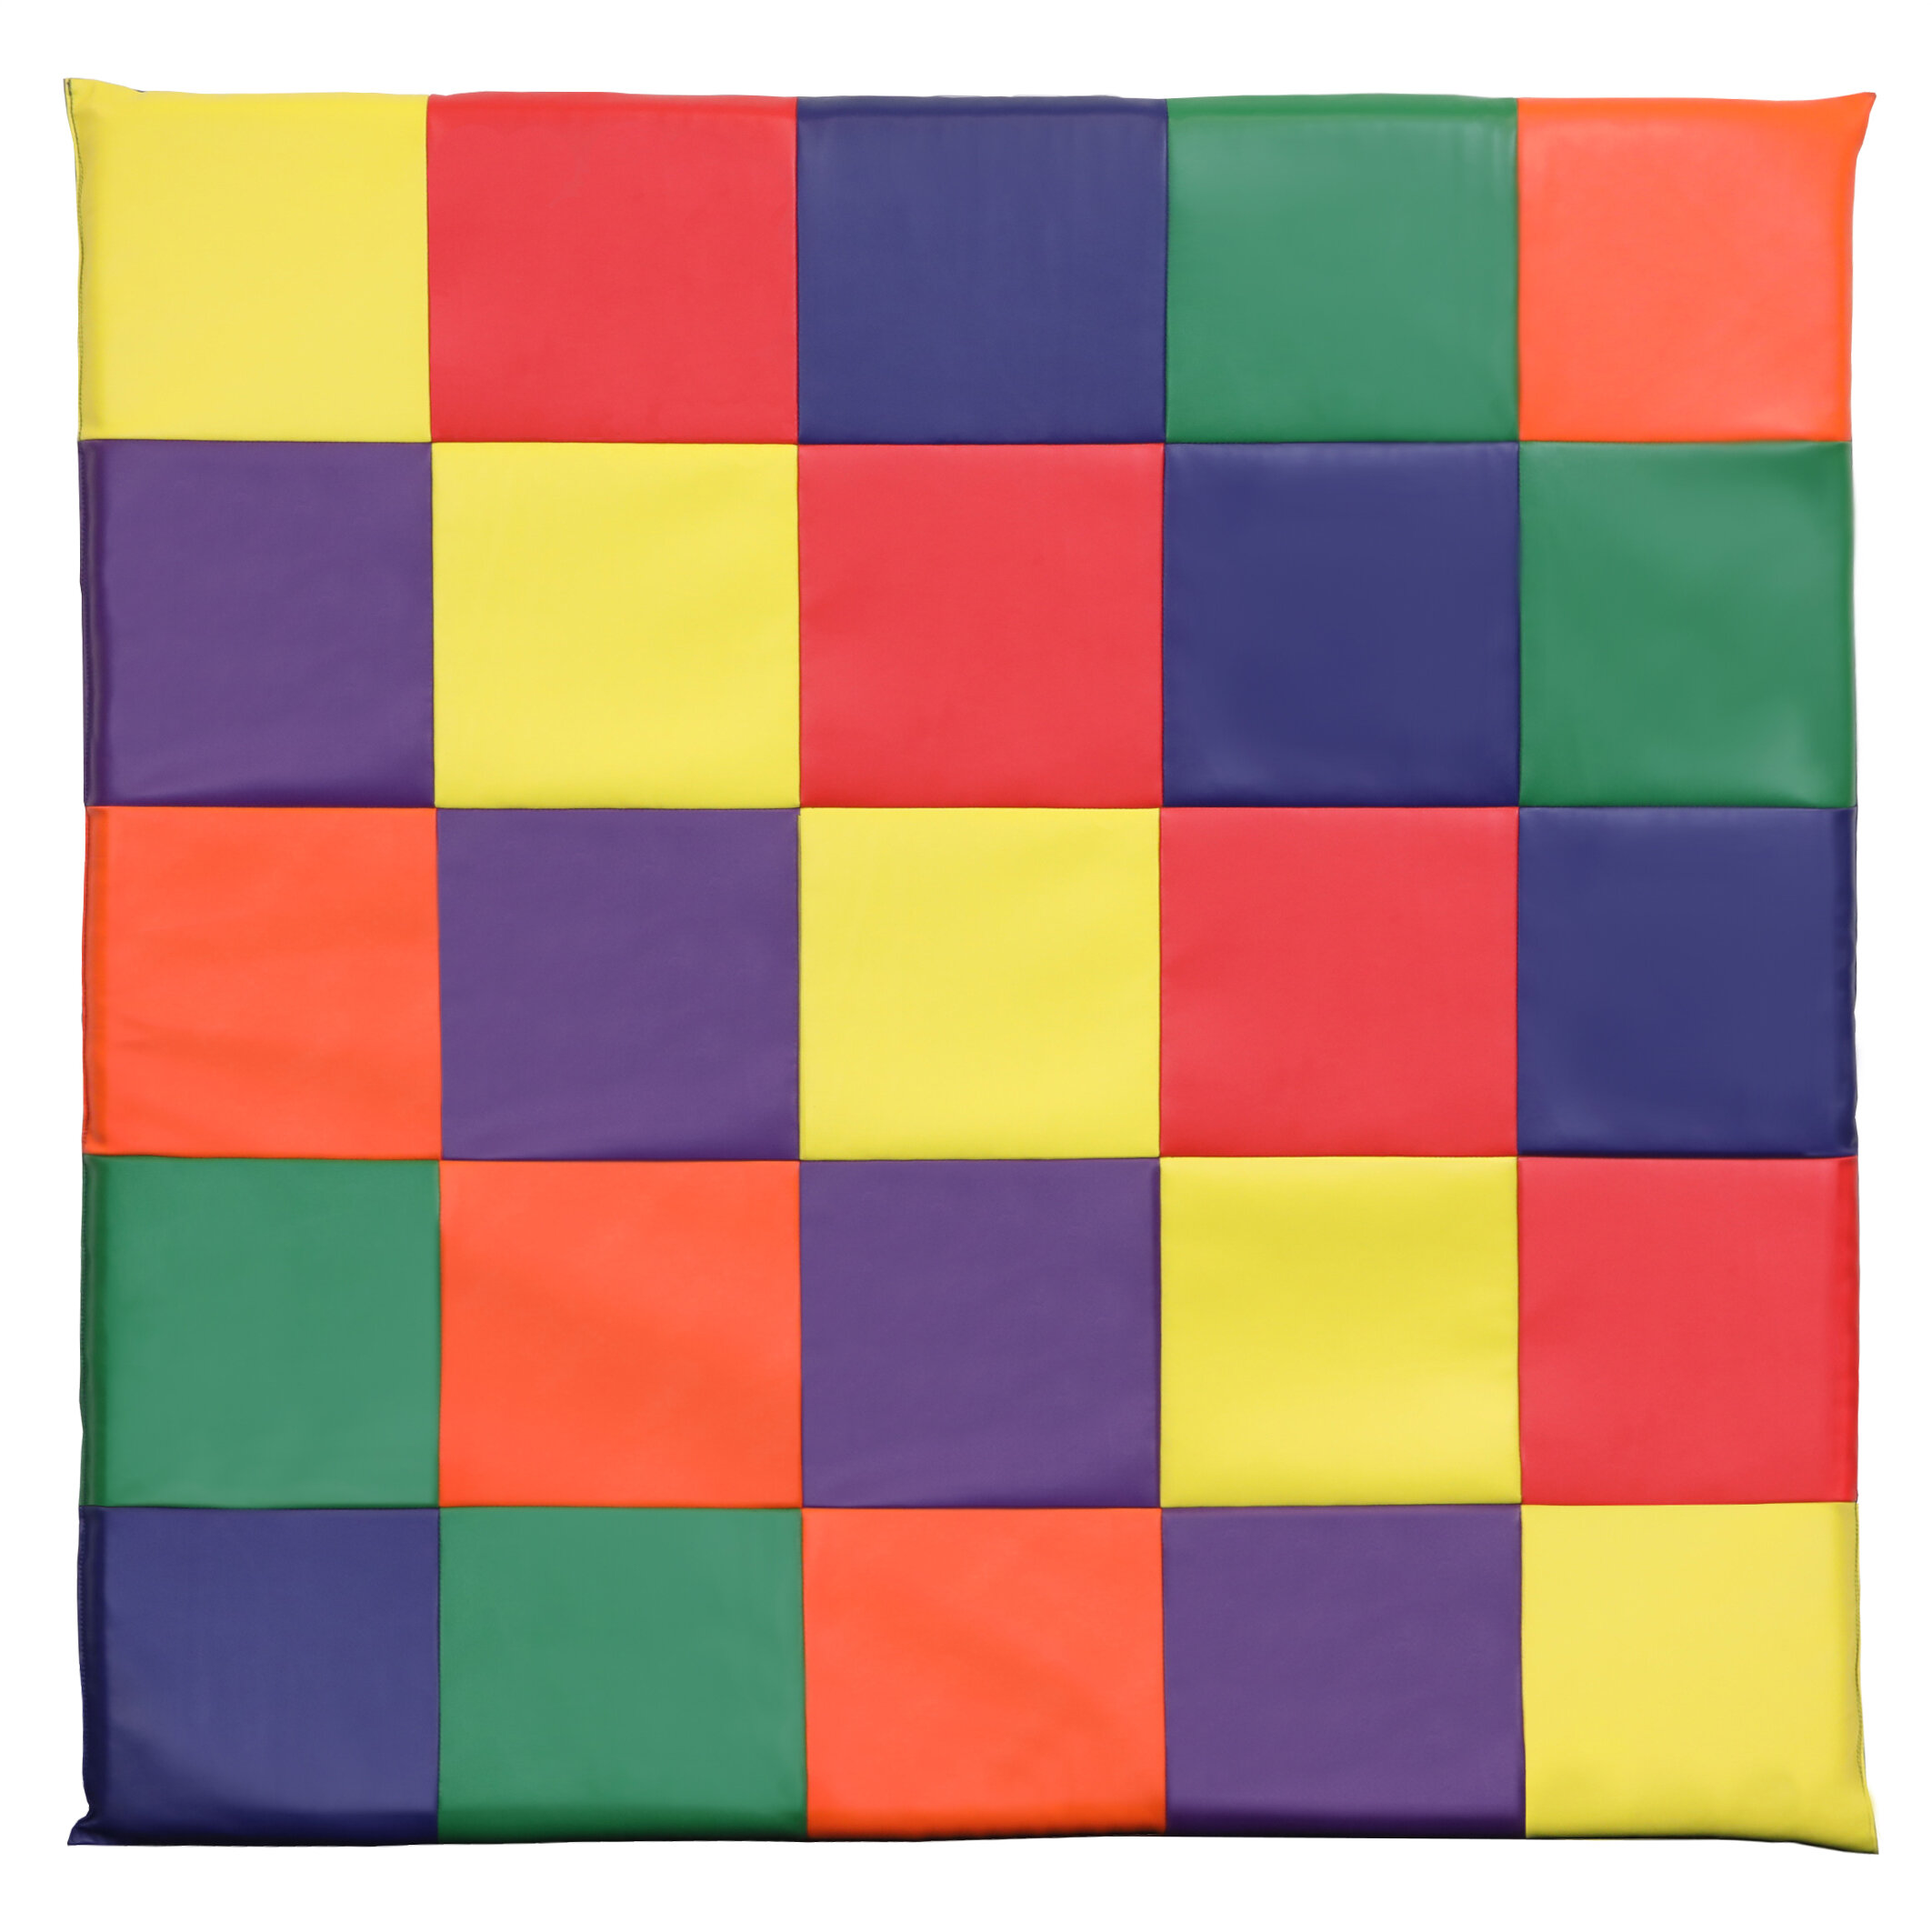 Floor mats for kids Foldable Baby Wayfair Best Price Quality Kids Soft Foam Floor Mat Wayfair